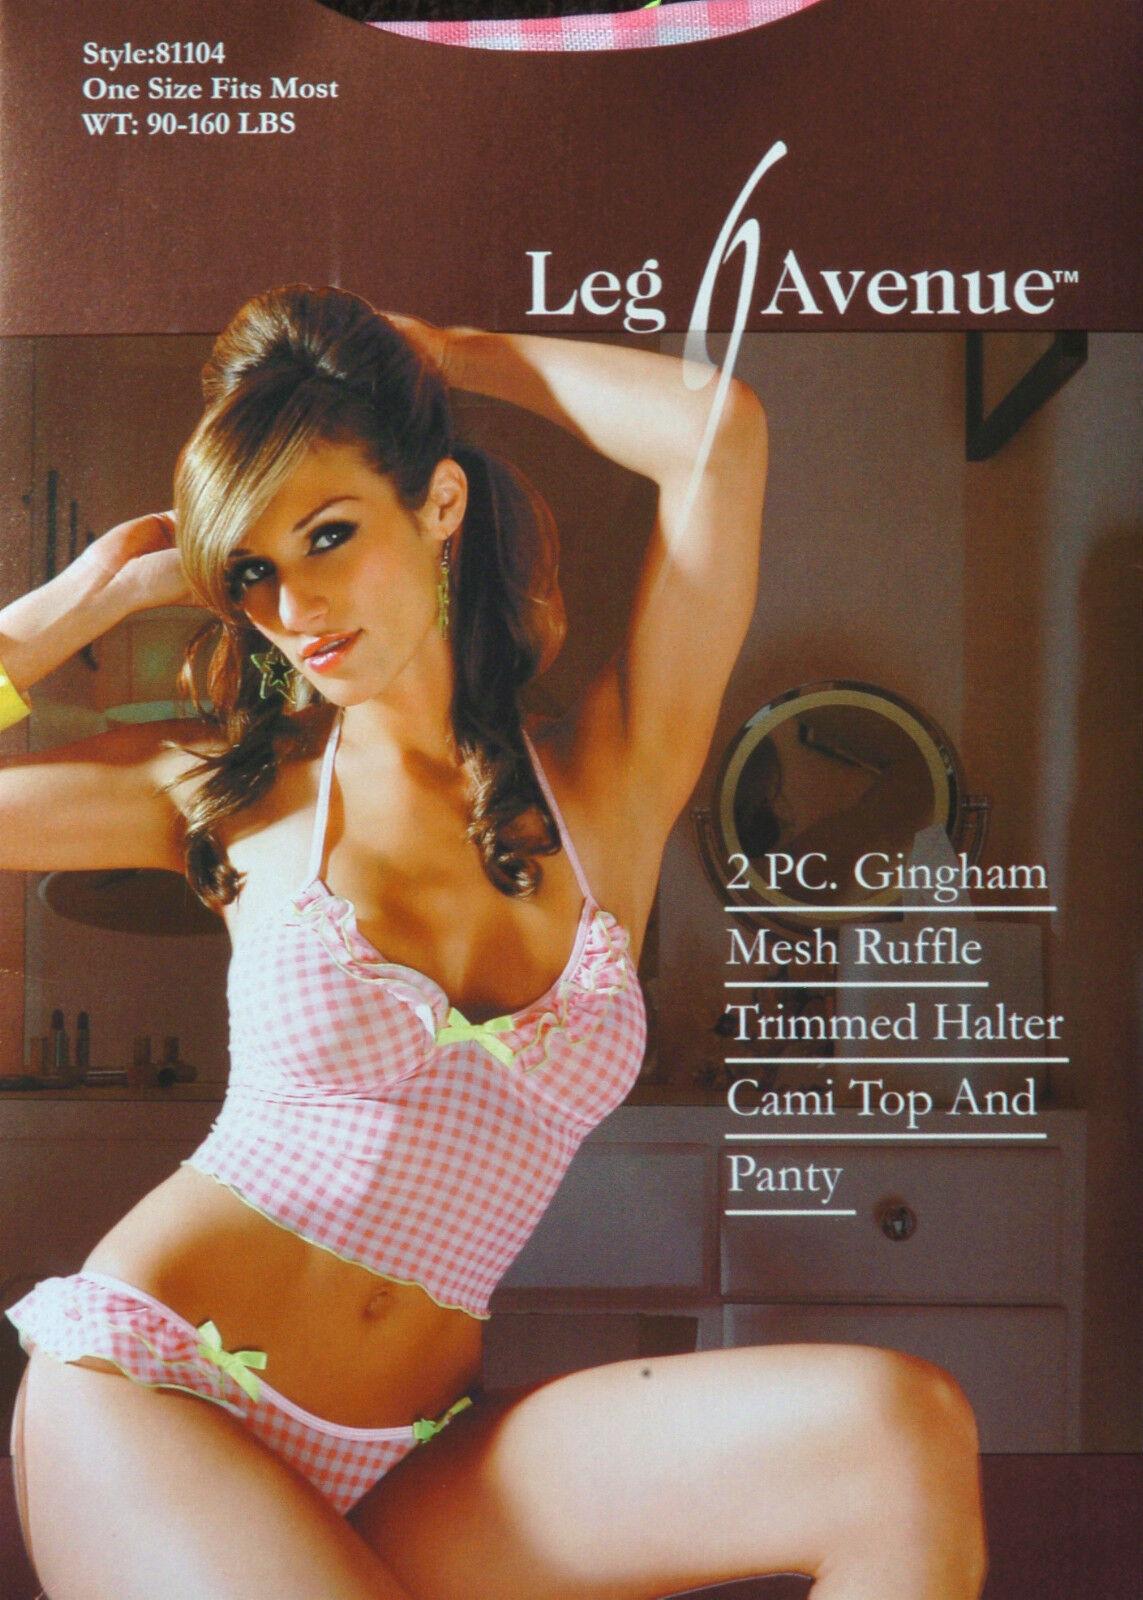 Leg Avenue Fashion 2-PC Gingham Halter Cami & Panty Set One Size